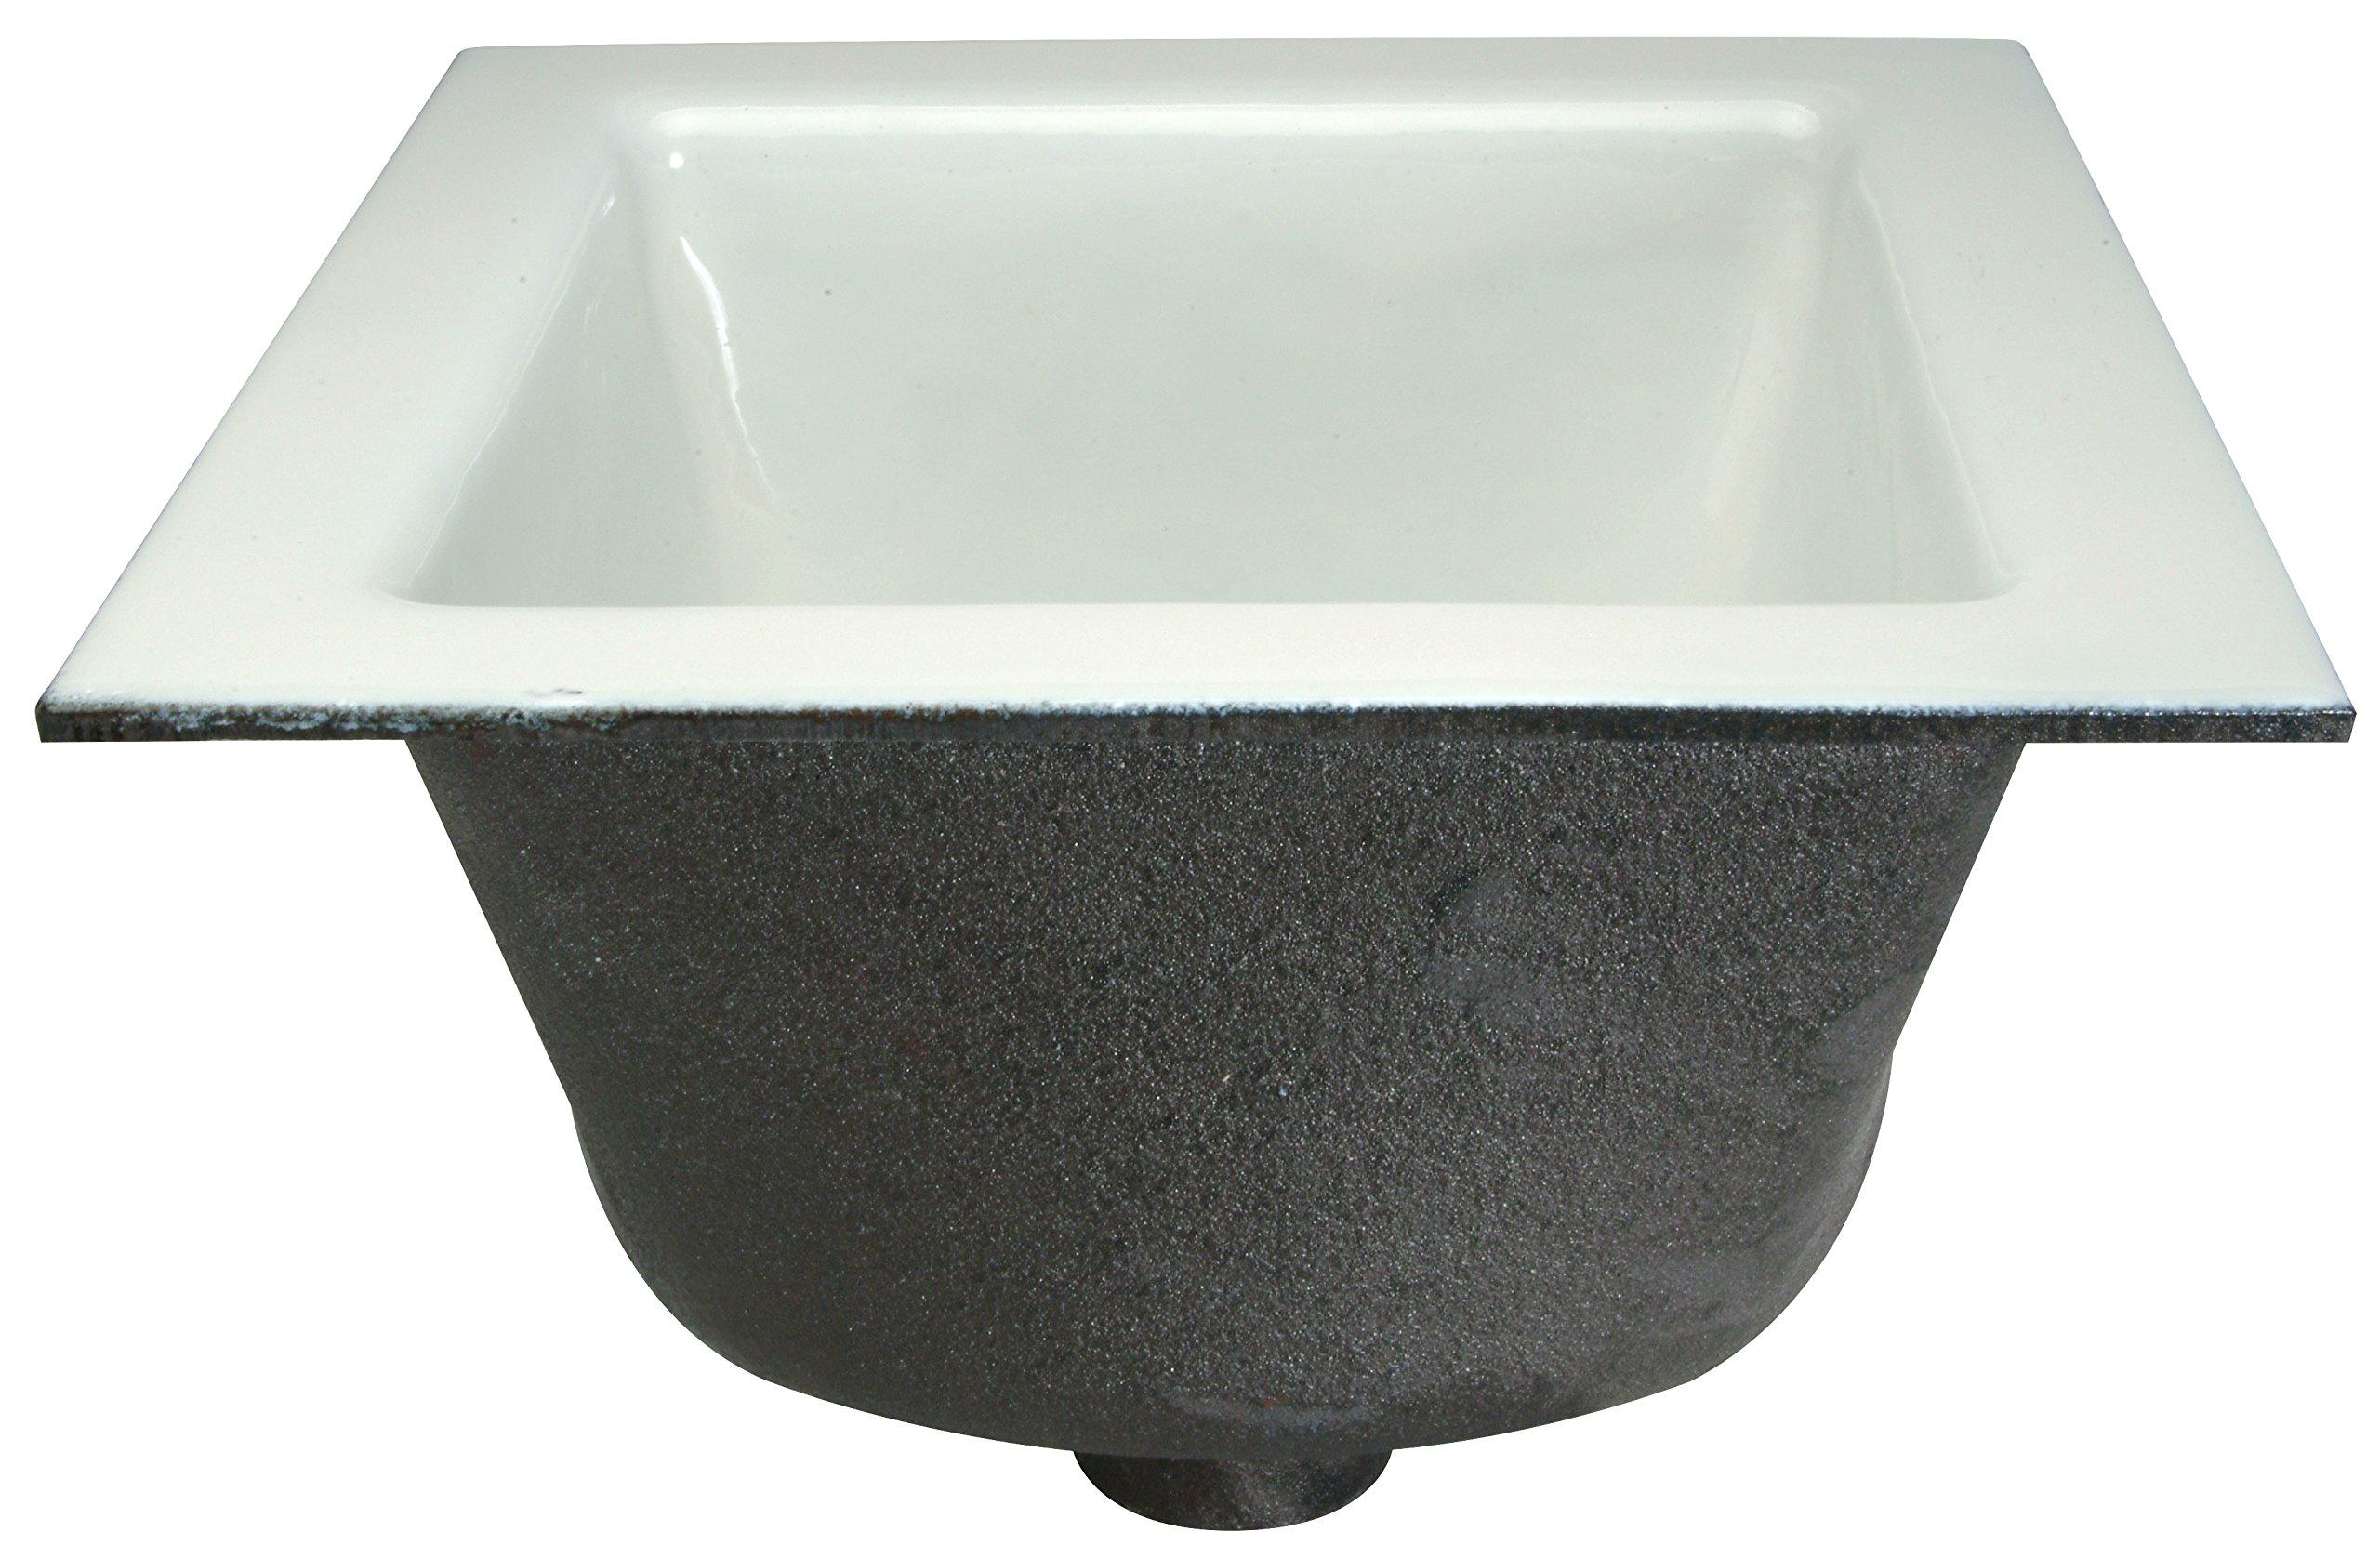 Floor Sink, 3 in Pipe, 12 x 12 x 6 in H by Zurn Industries